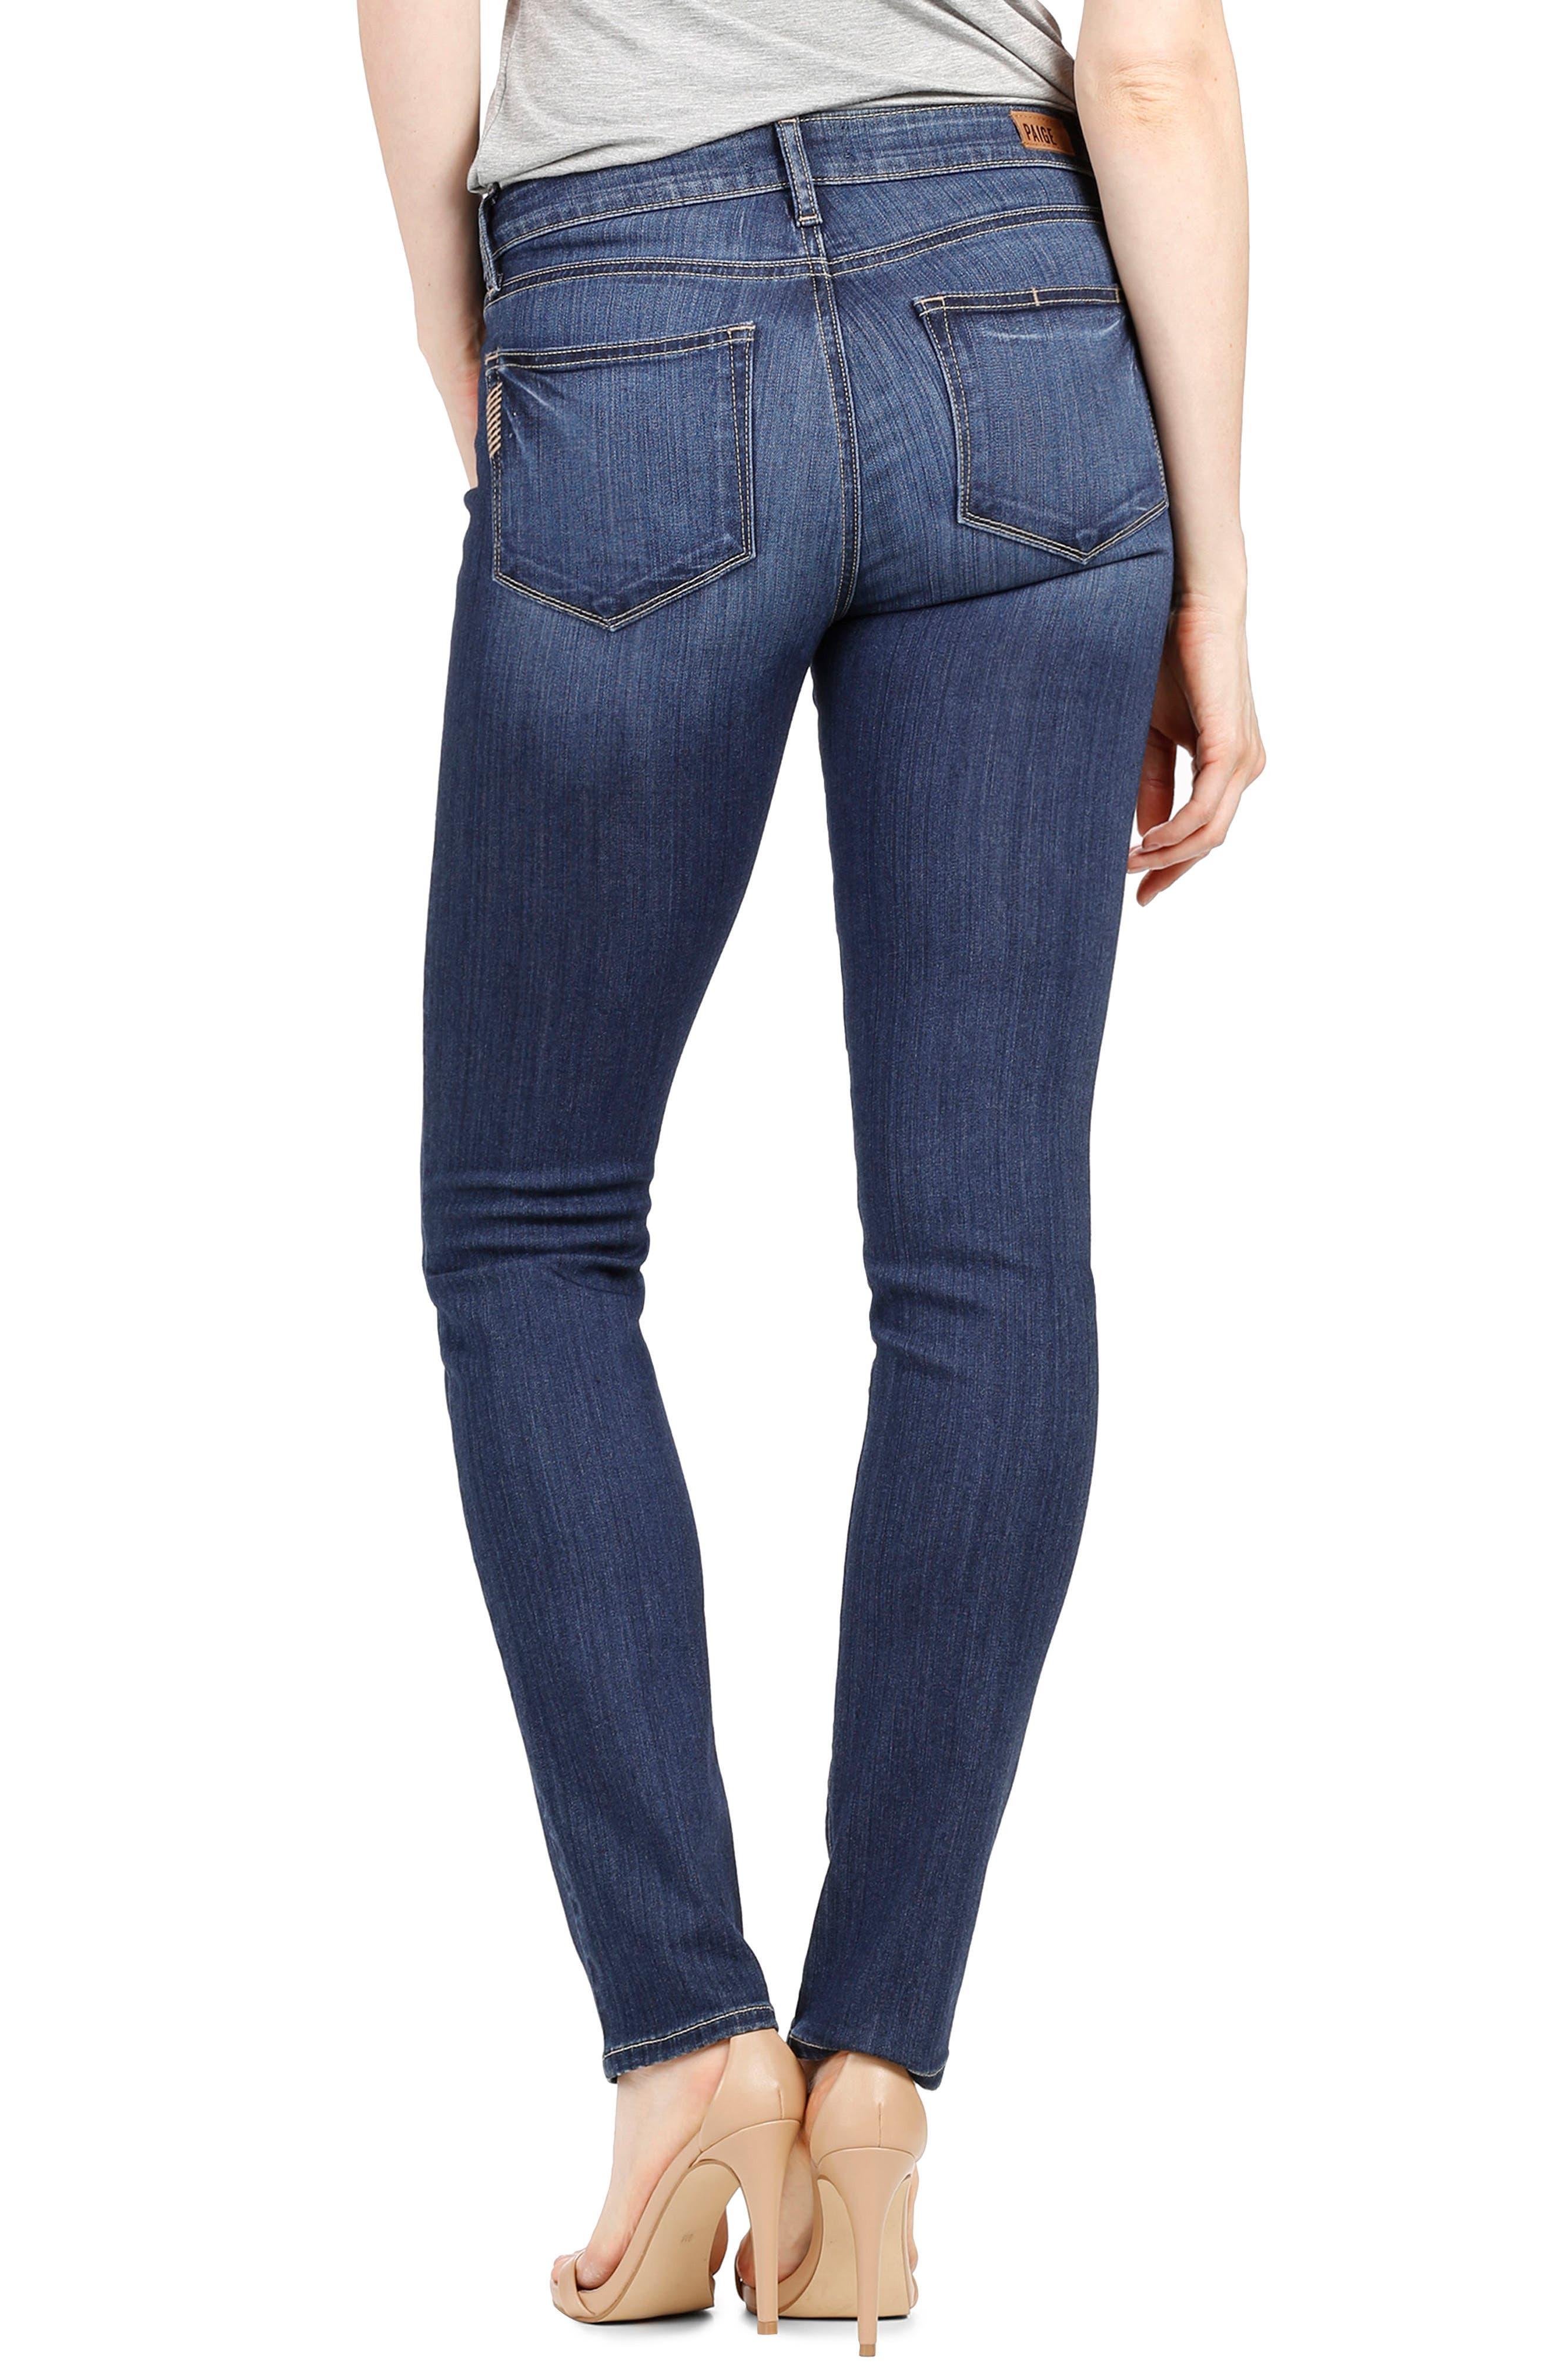 Transcend - Skyline Skinny Jeans,                             Alternate thumbnail 2, color,                             400